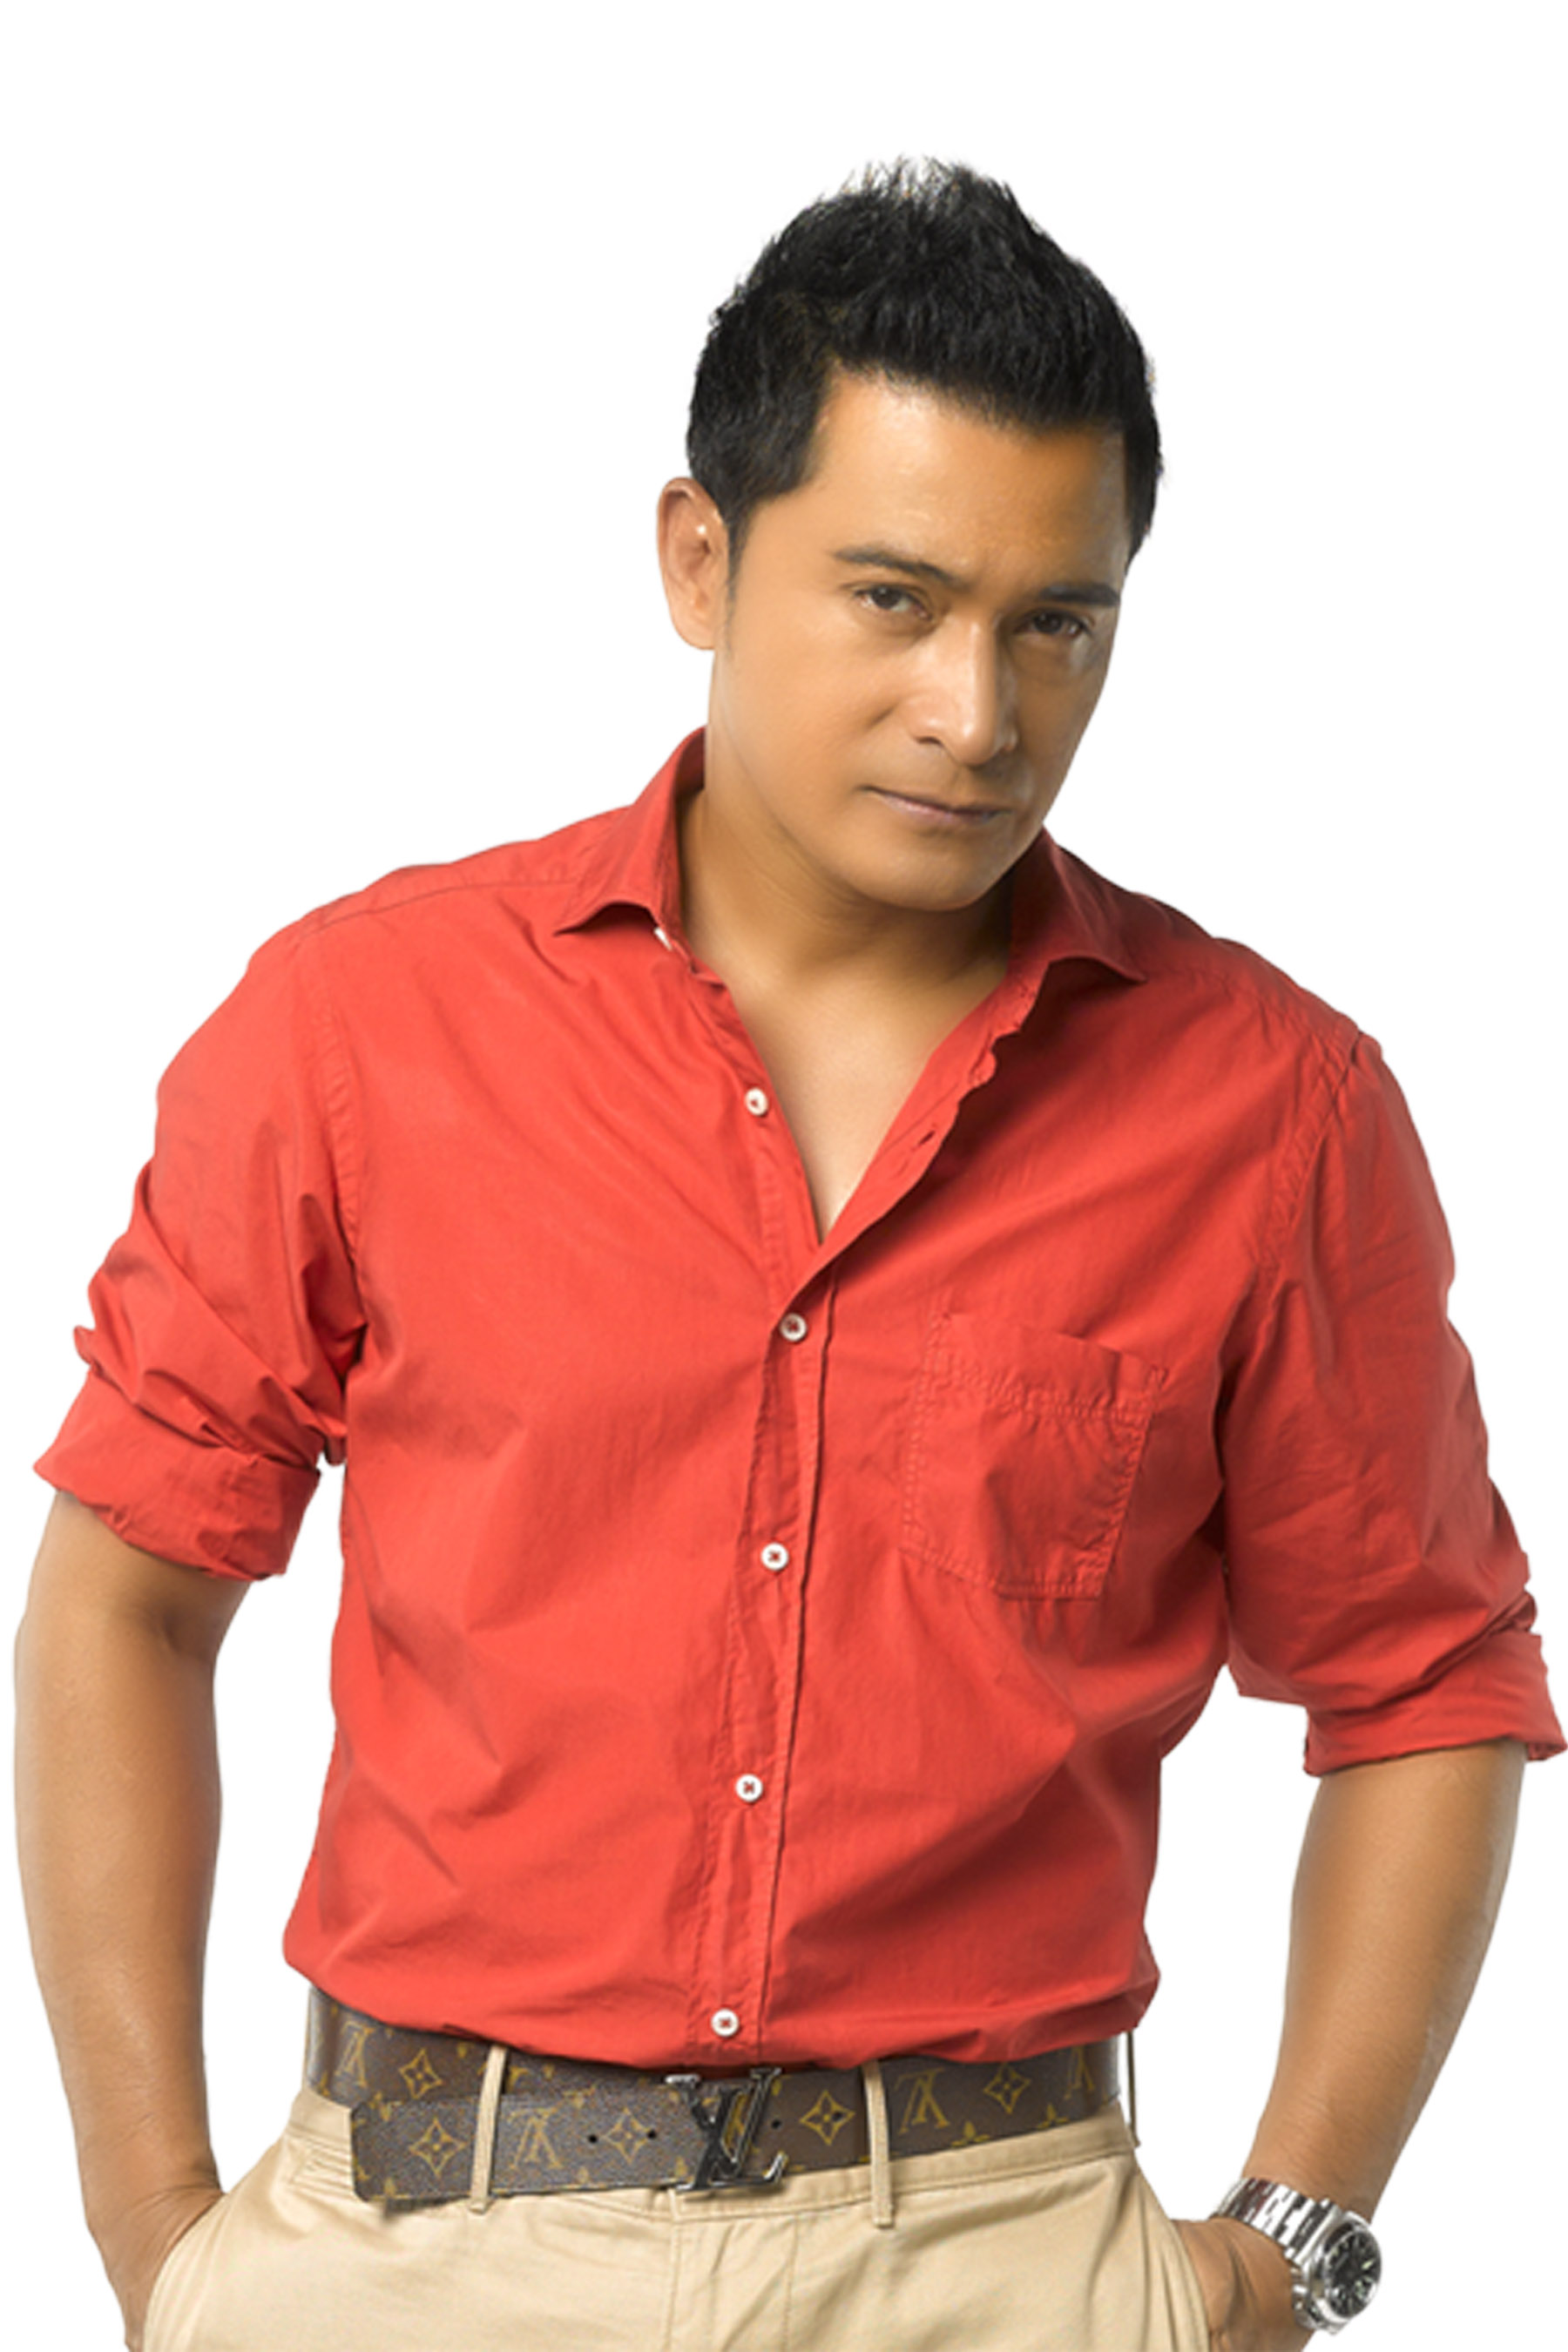 Actor Cesar Montano - age: 58